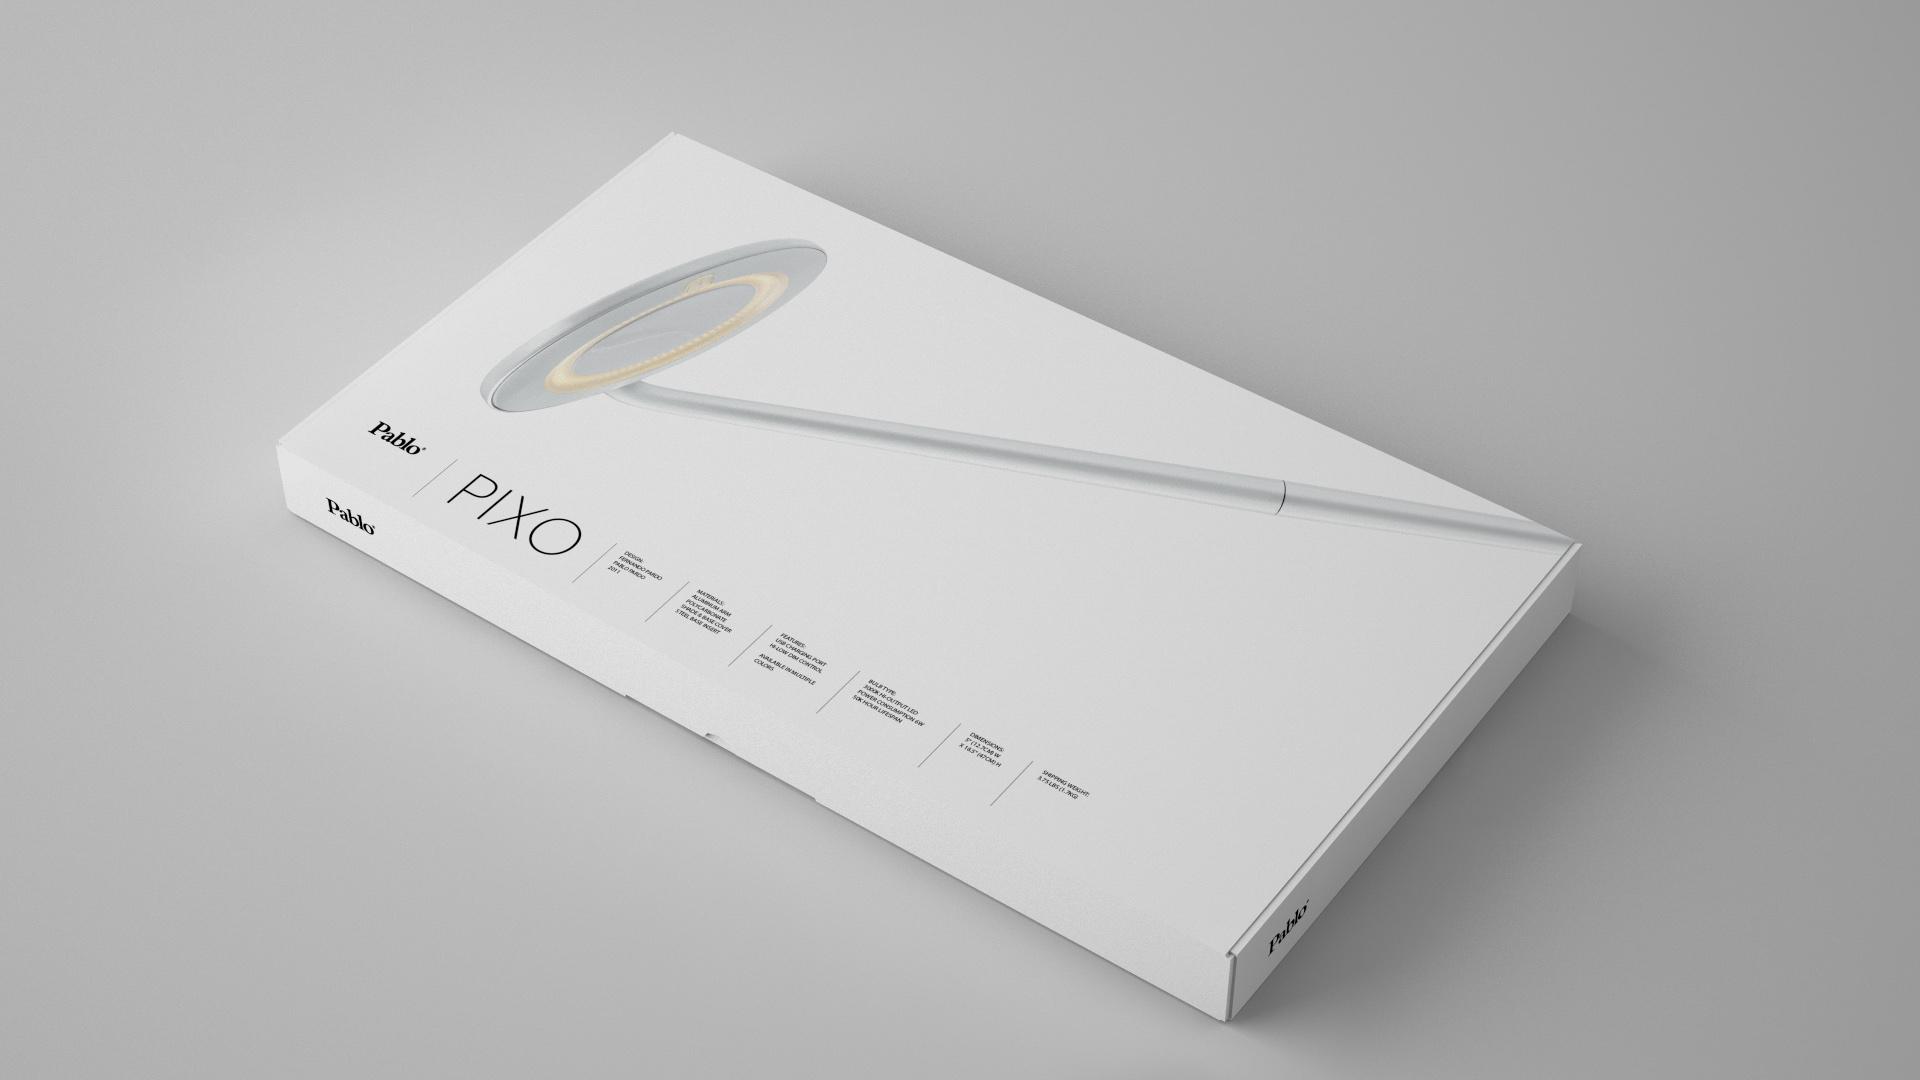 Untitled1_0003_PackagingStudio_v09_REV.psd.jpg